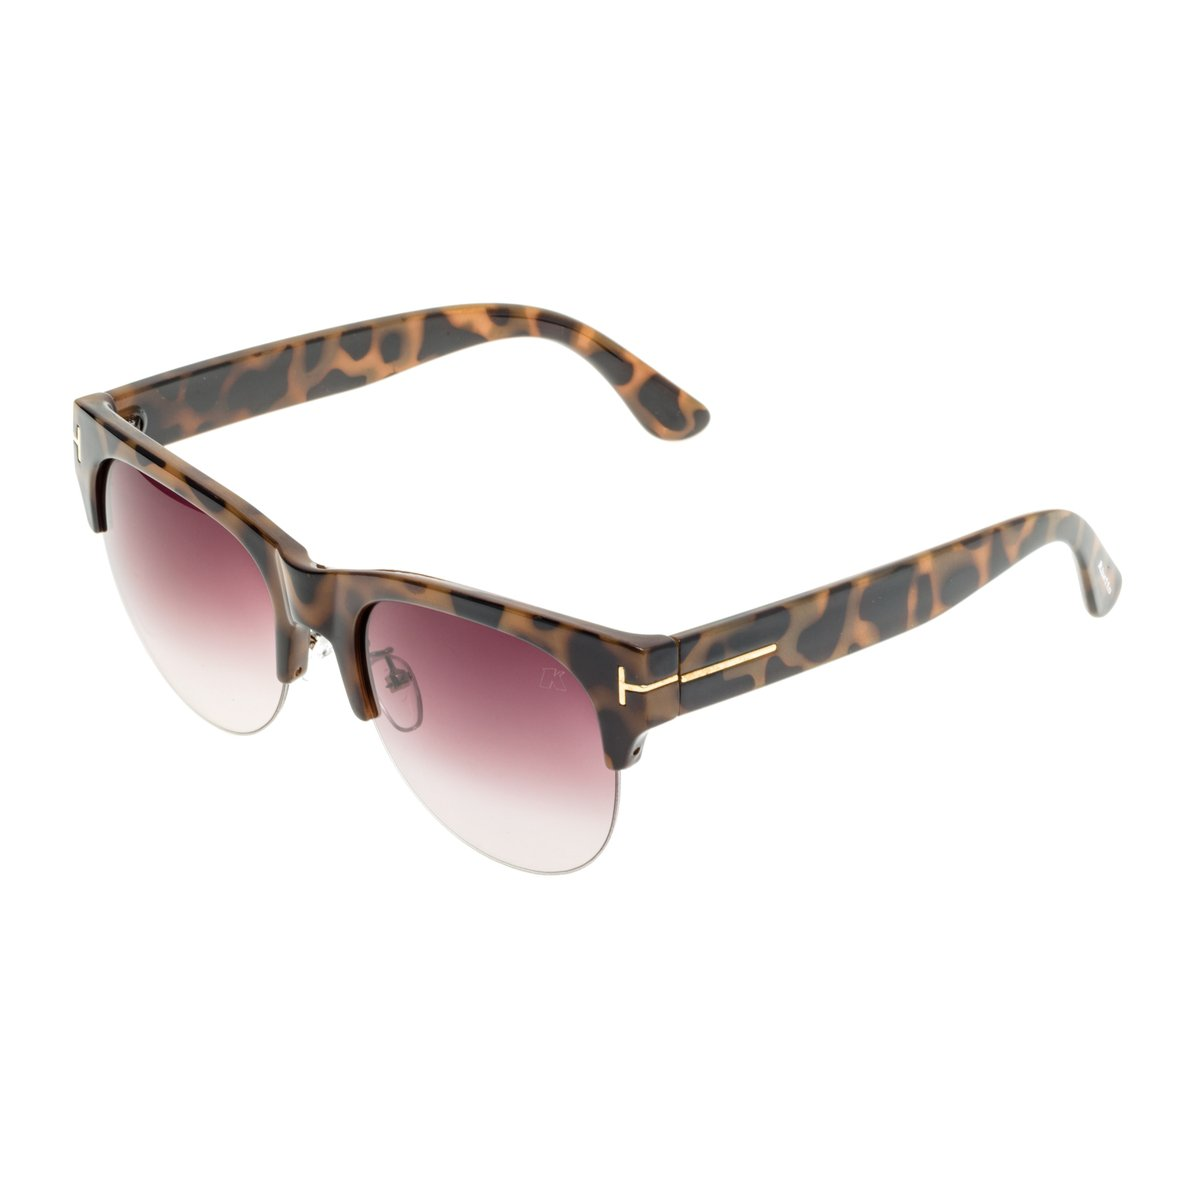 6aaee80d9a65e Óculos de Sol Khatto KT1158 - Compre Agora